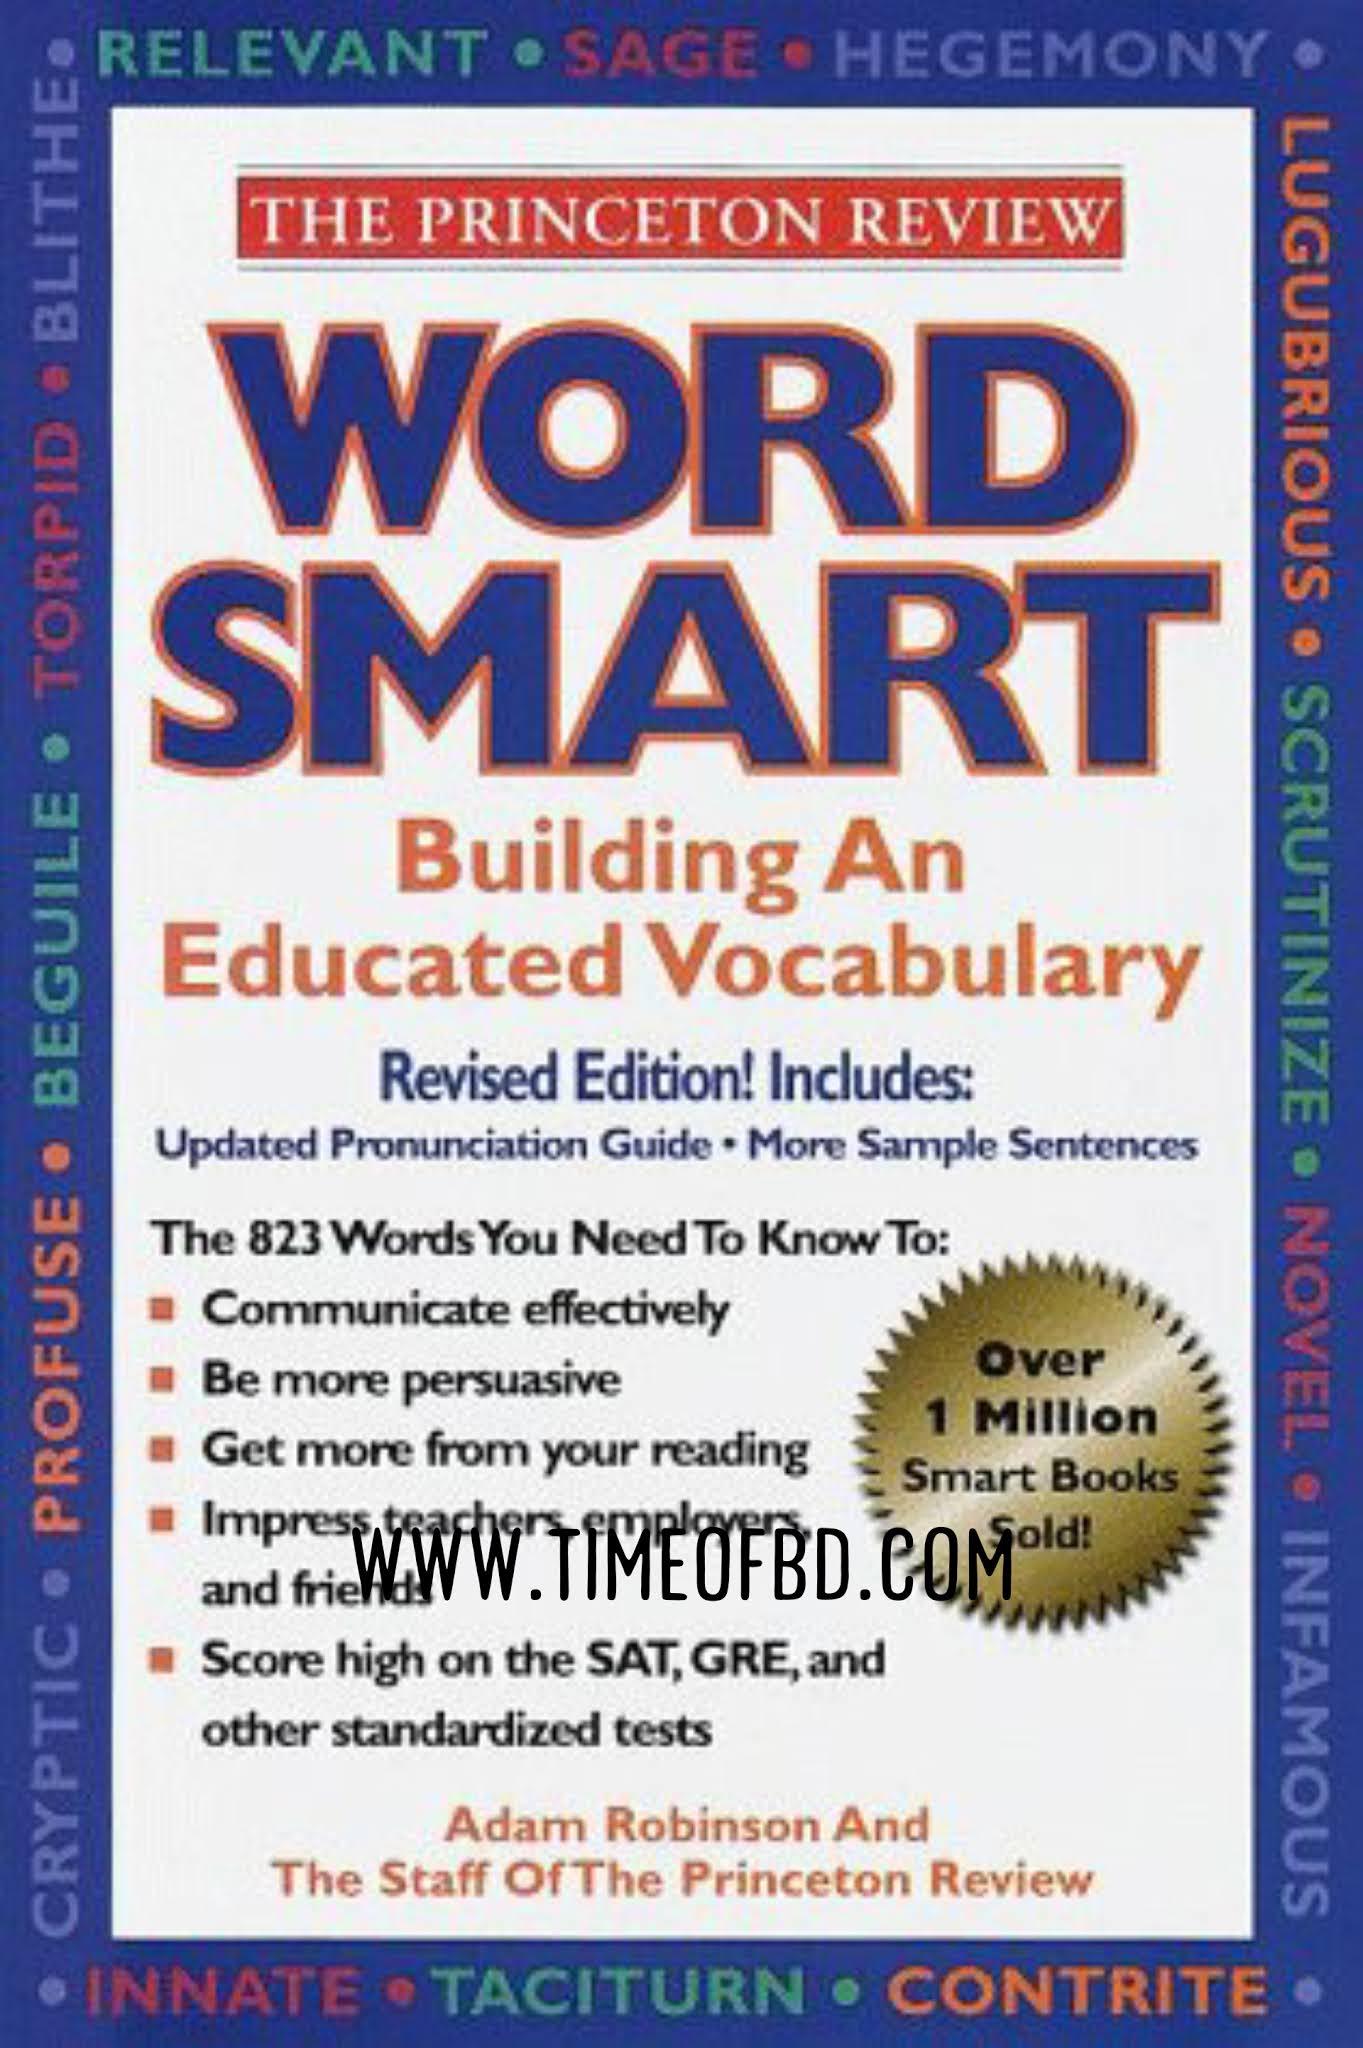 word smart book pdf, word smart book pdf download, word smart bangla pdf, ওয়ার্ড স্মার্ট বাংলা পিডিএফ